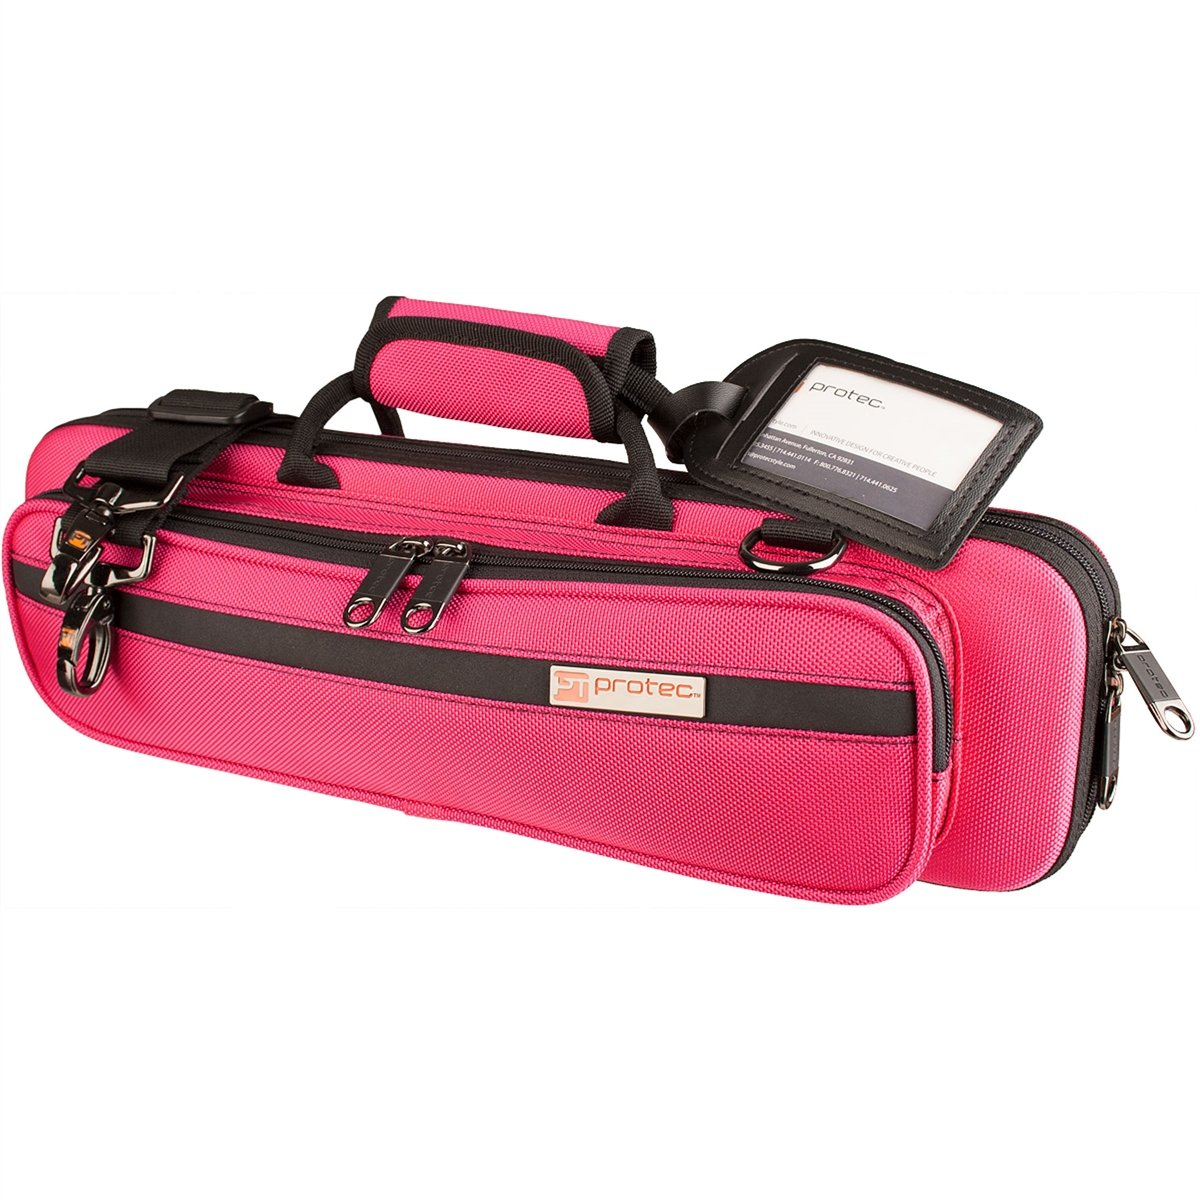 Flute PRO PAC Case - Slimline (Hot Pink)